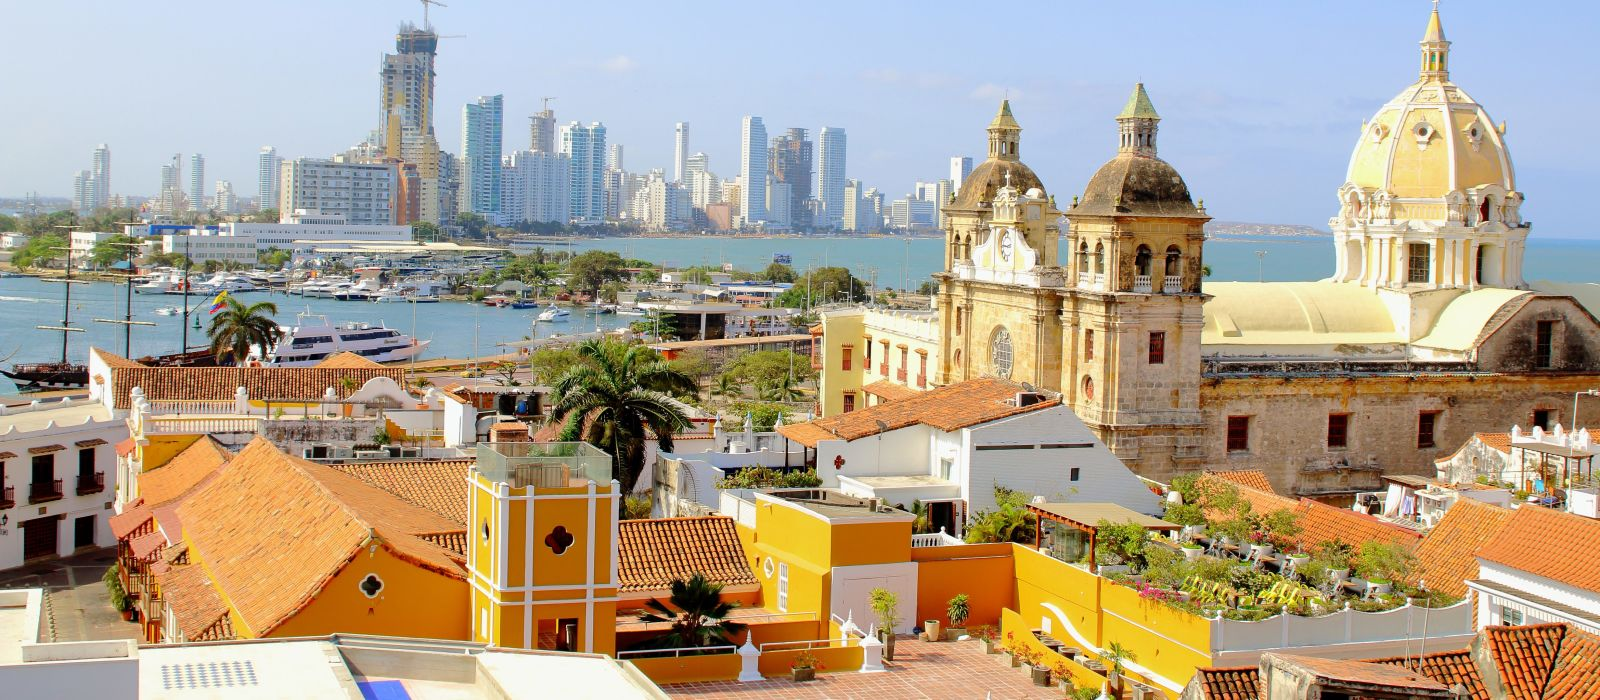 Kolumbien: Großstadtleben, Kaffee & Kolonialflair Urlaub 3